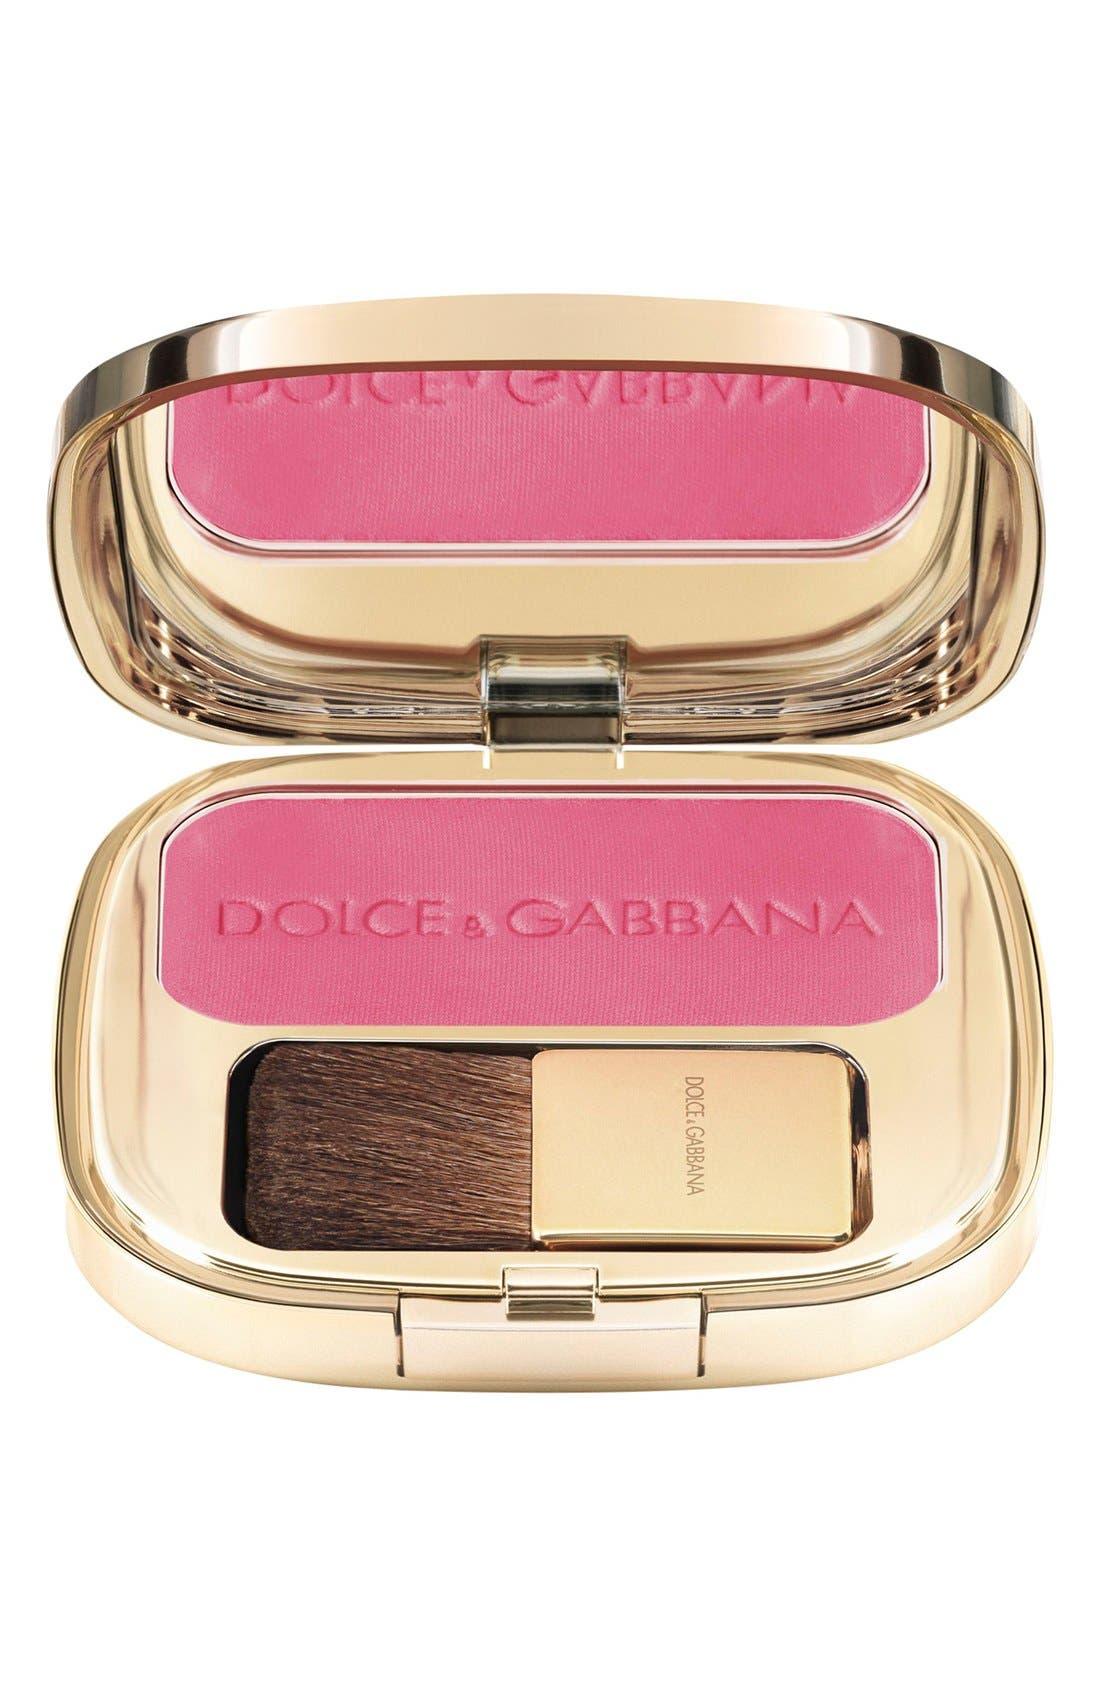 DOLCE&GABBANA BEAUTY Luminous Cheek Color Blush, Main, color, 659